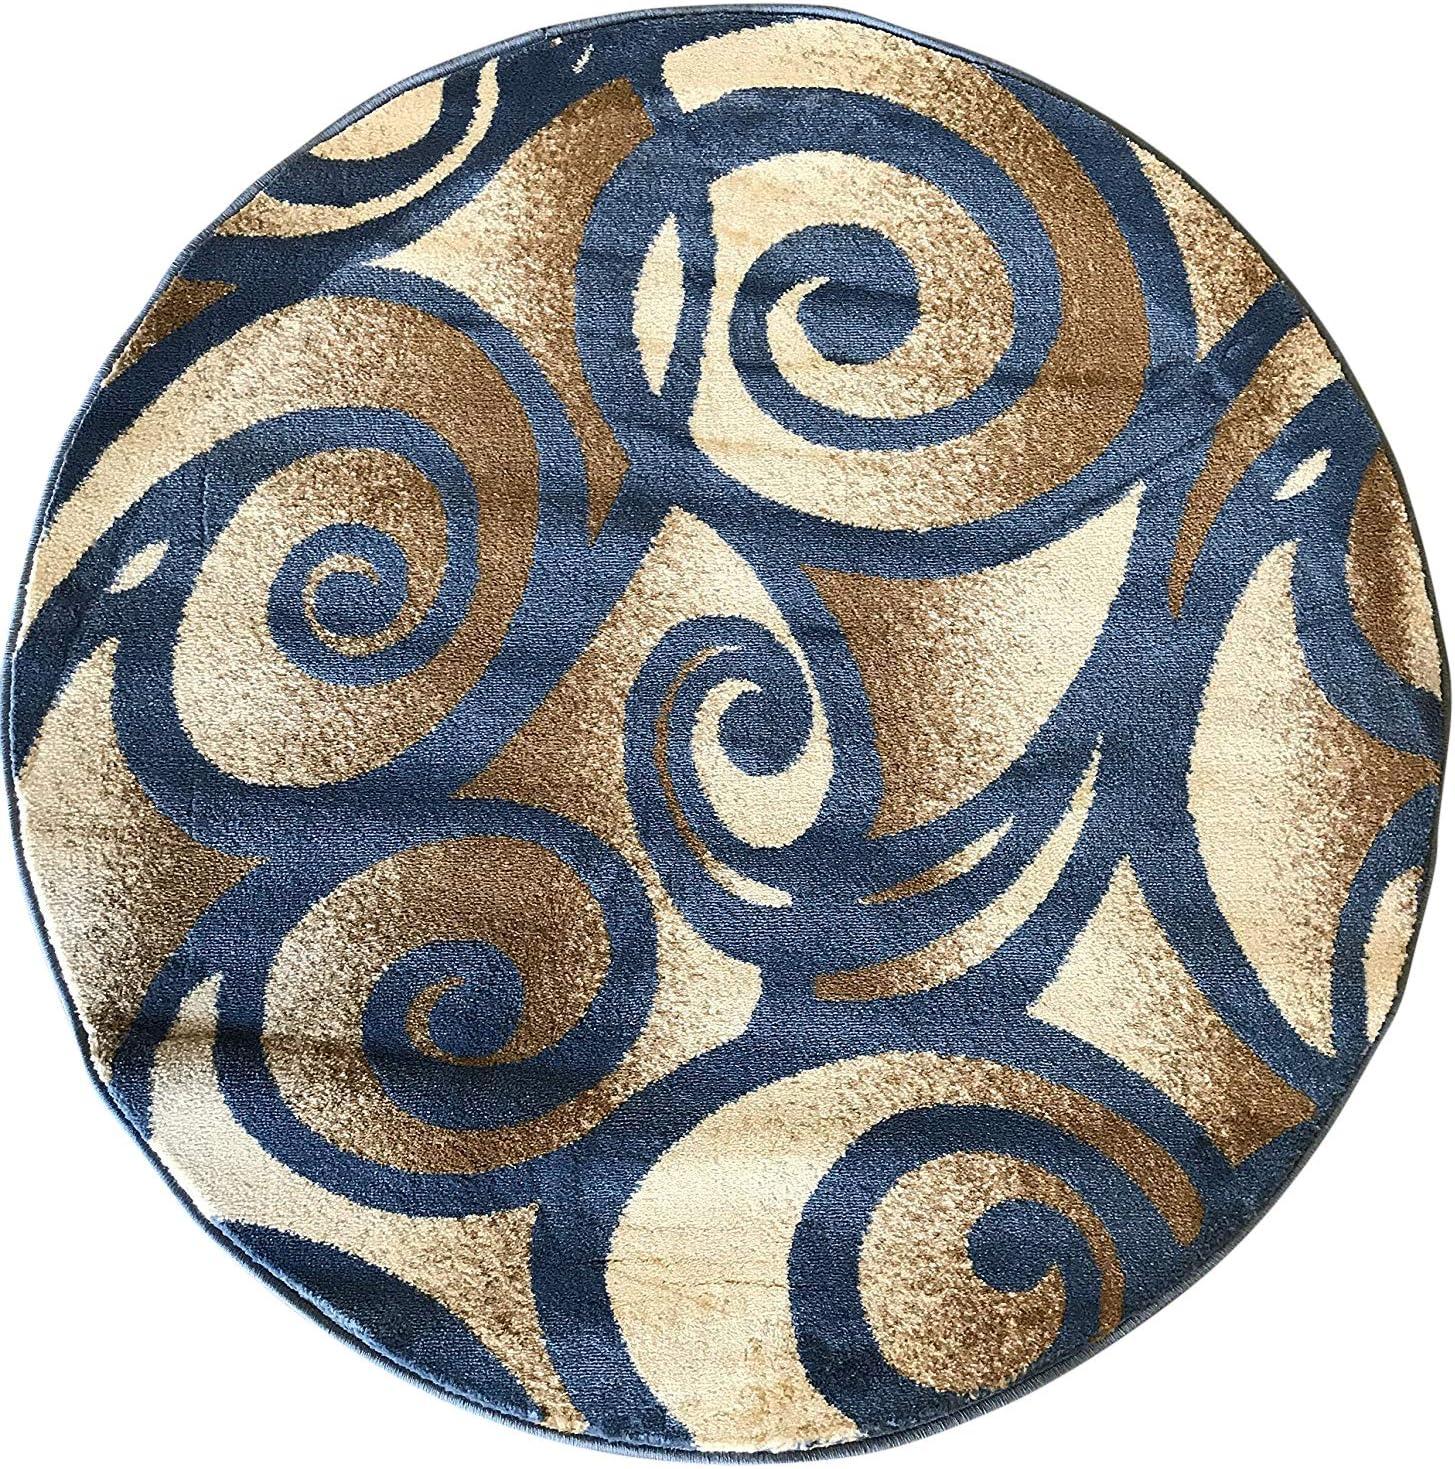 Modern Round Contemporary Area Rug Challenge the lowest price 341 Design Light Sale item Blue Bellagi